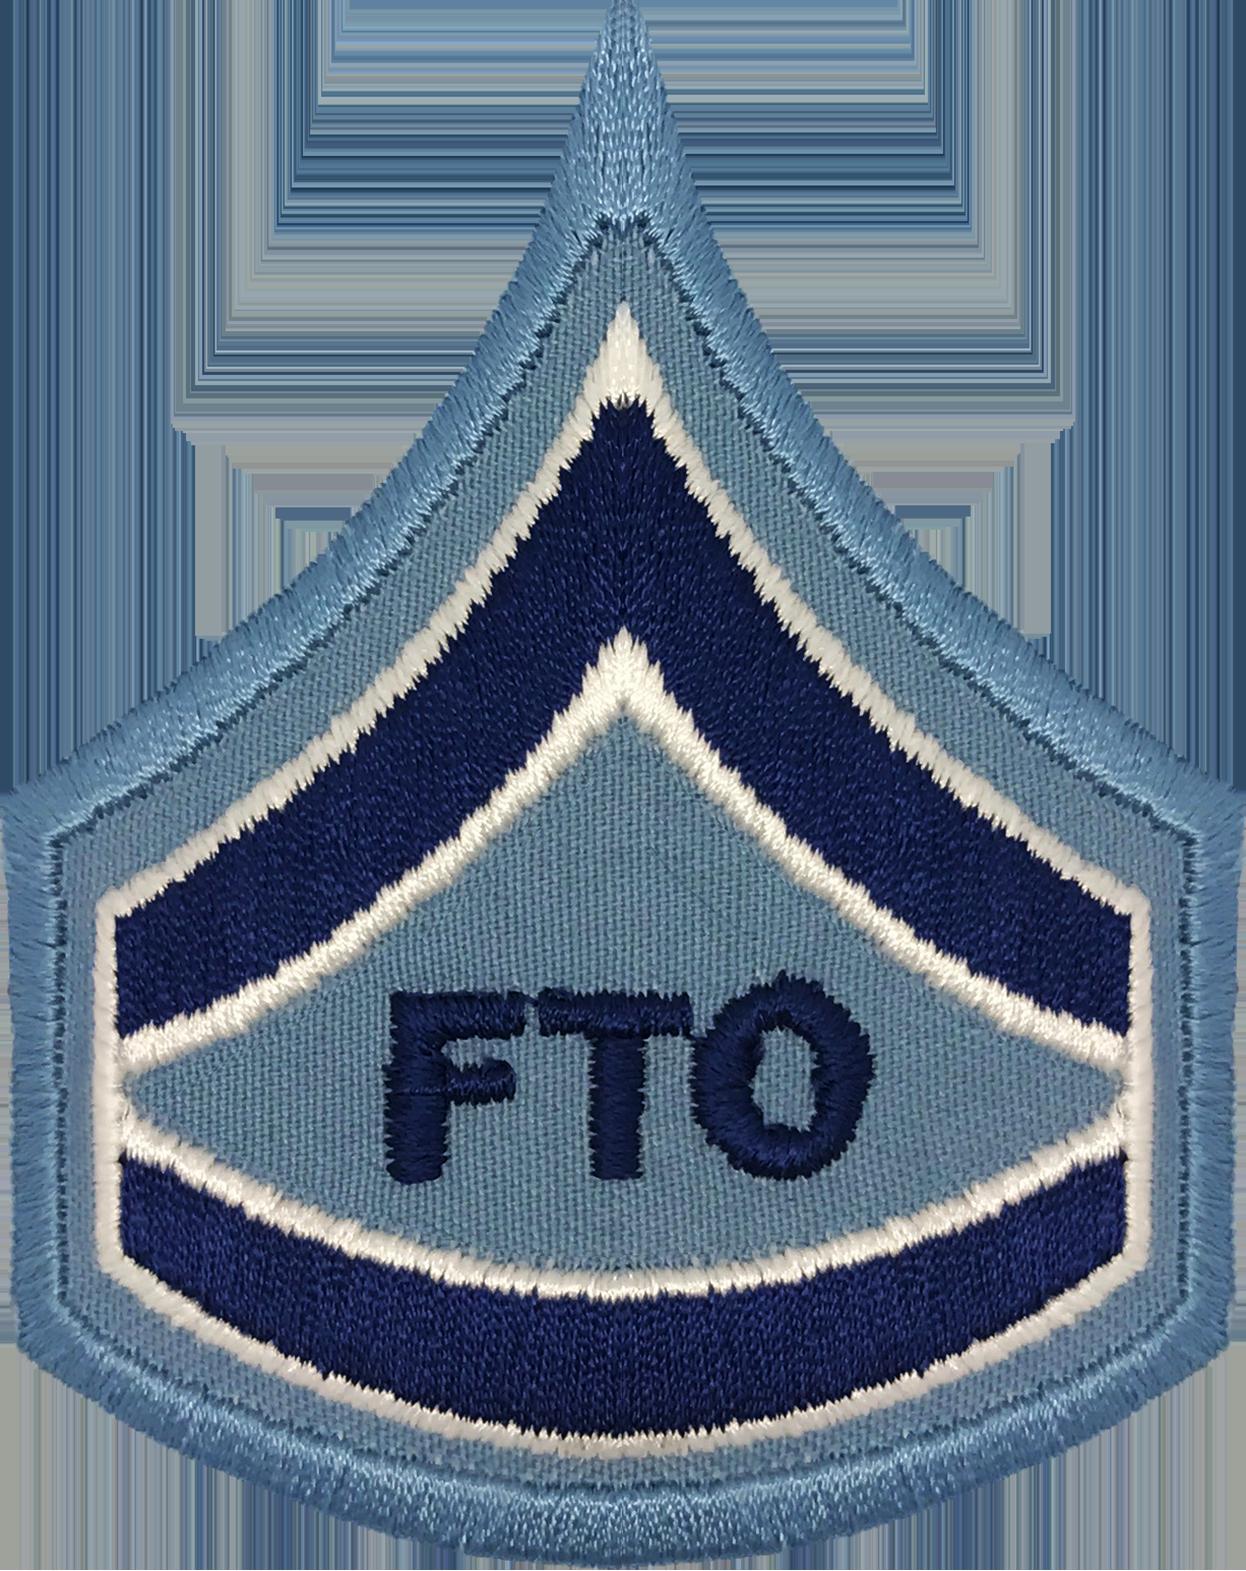 Field Training Officer - Uniform Shirt